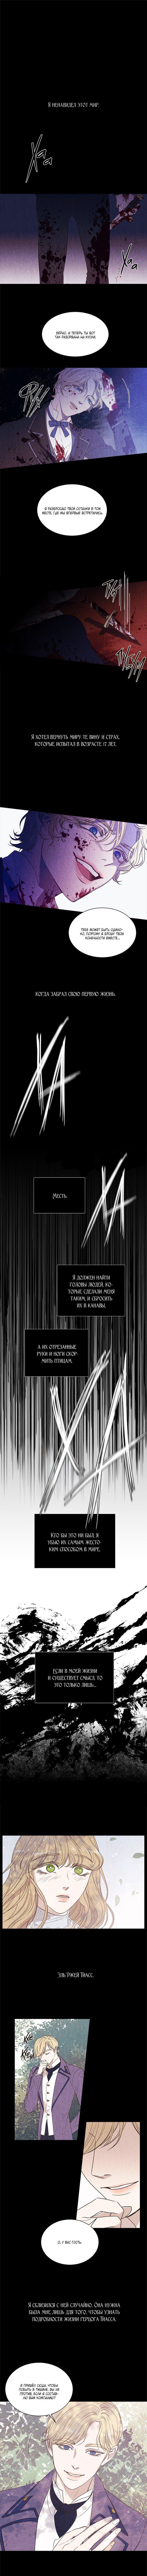 Манга Спасительница злодея - Глава 42 Страница 1